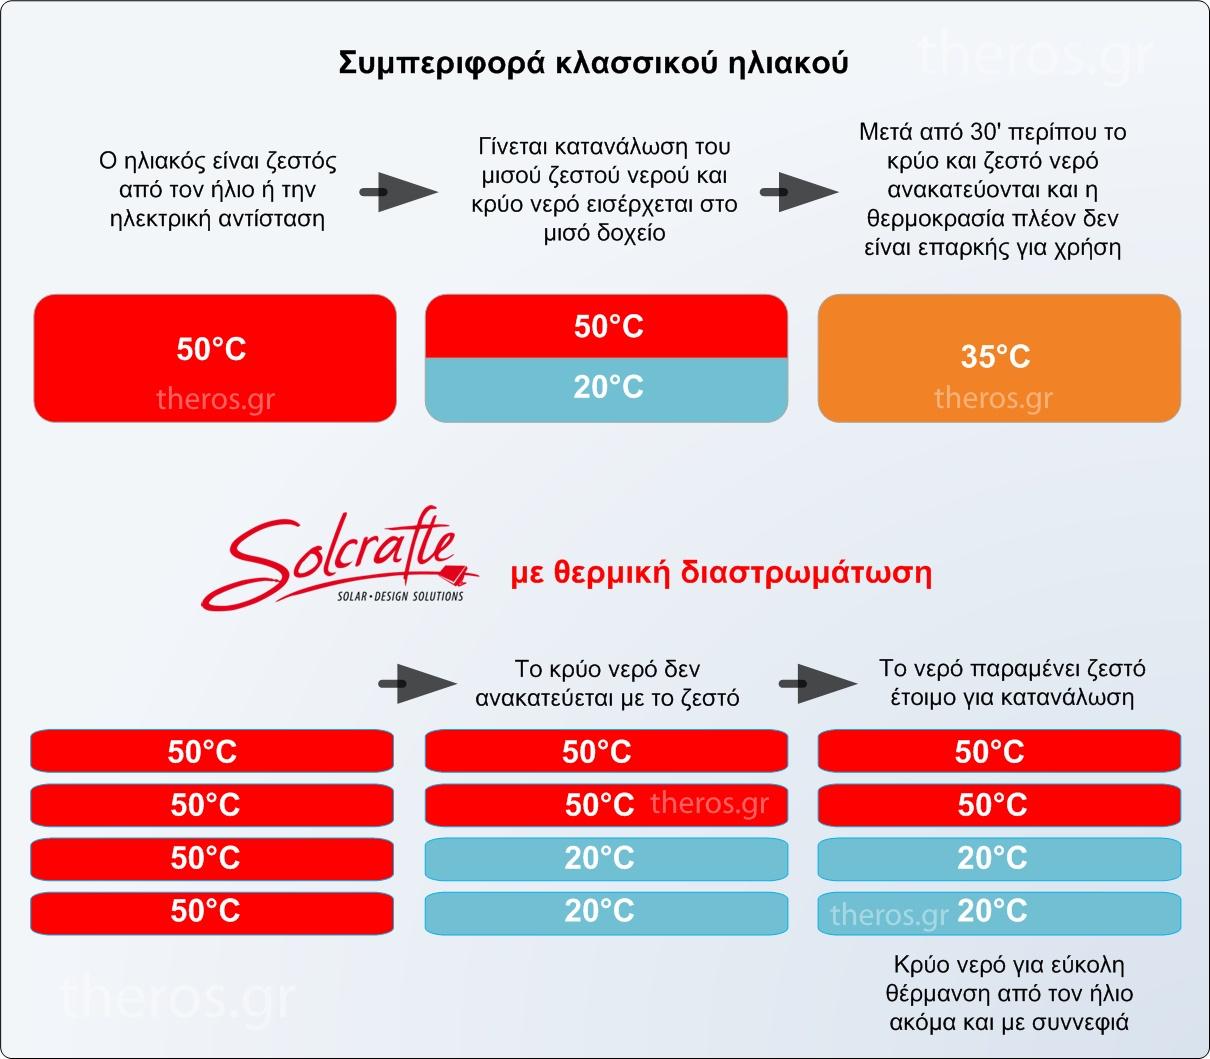 Solcrafte Plus θερμική διαστρωμάτωση